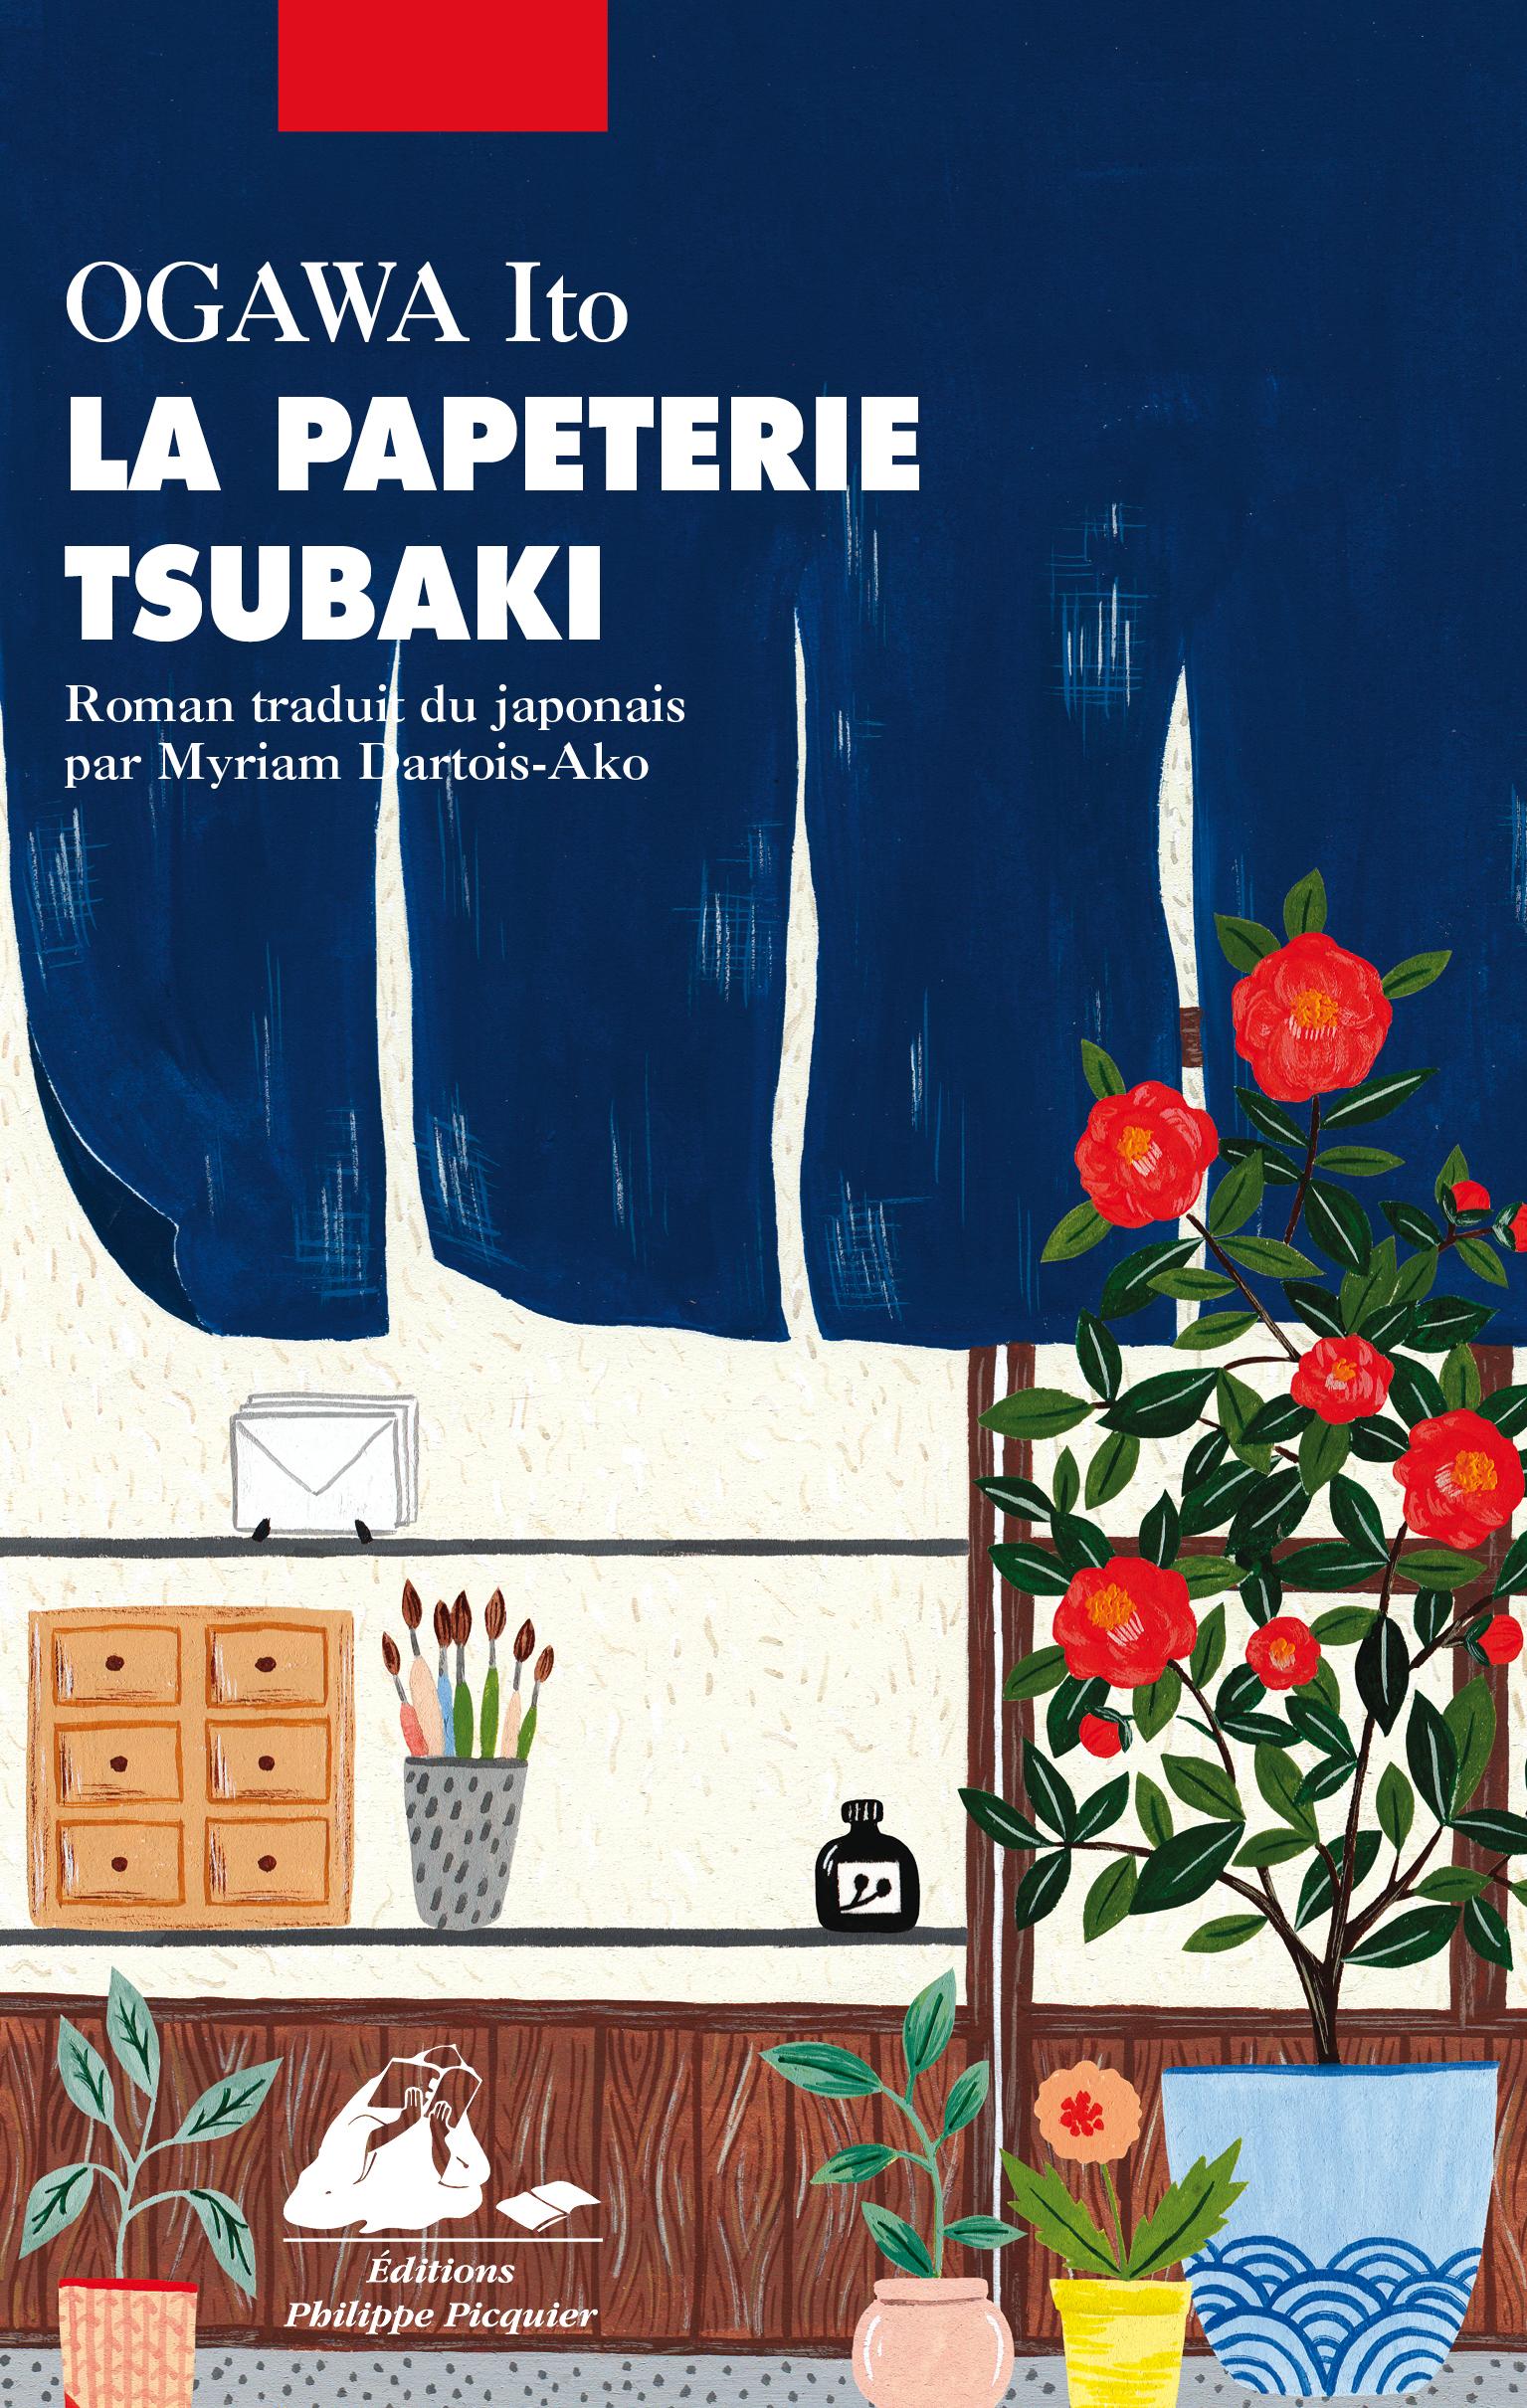 La Papeterie Tsubaki | OGAWA, Ito